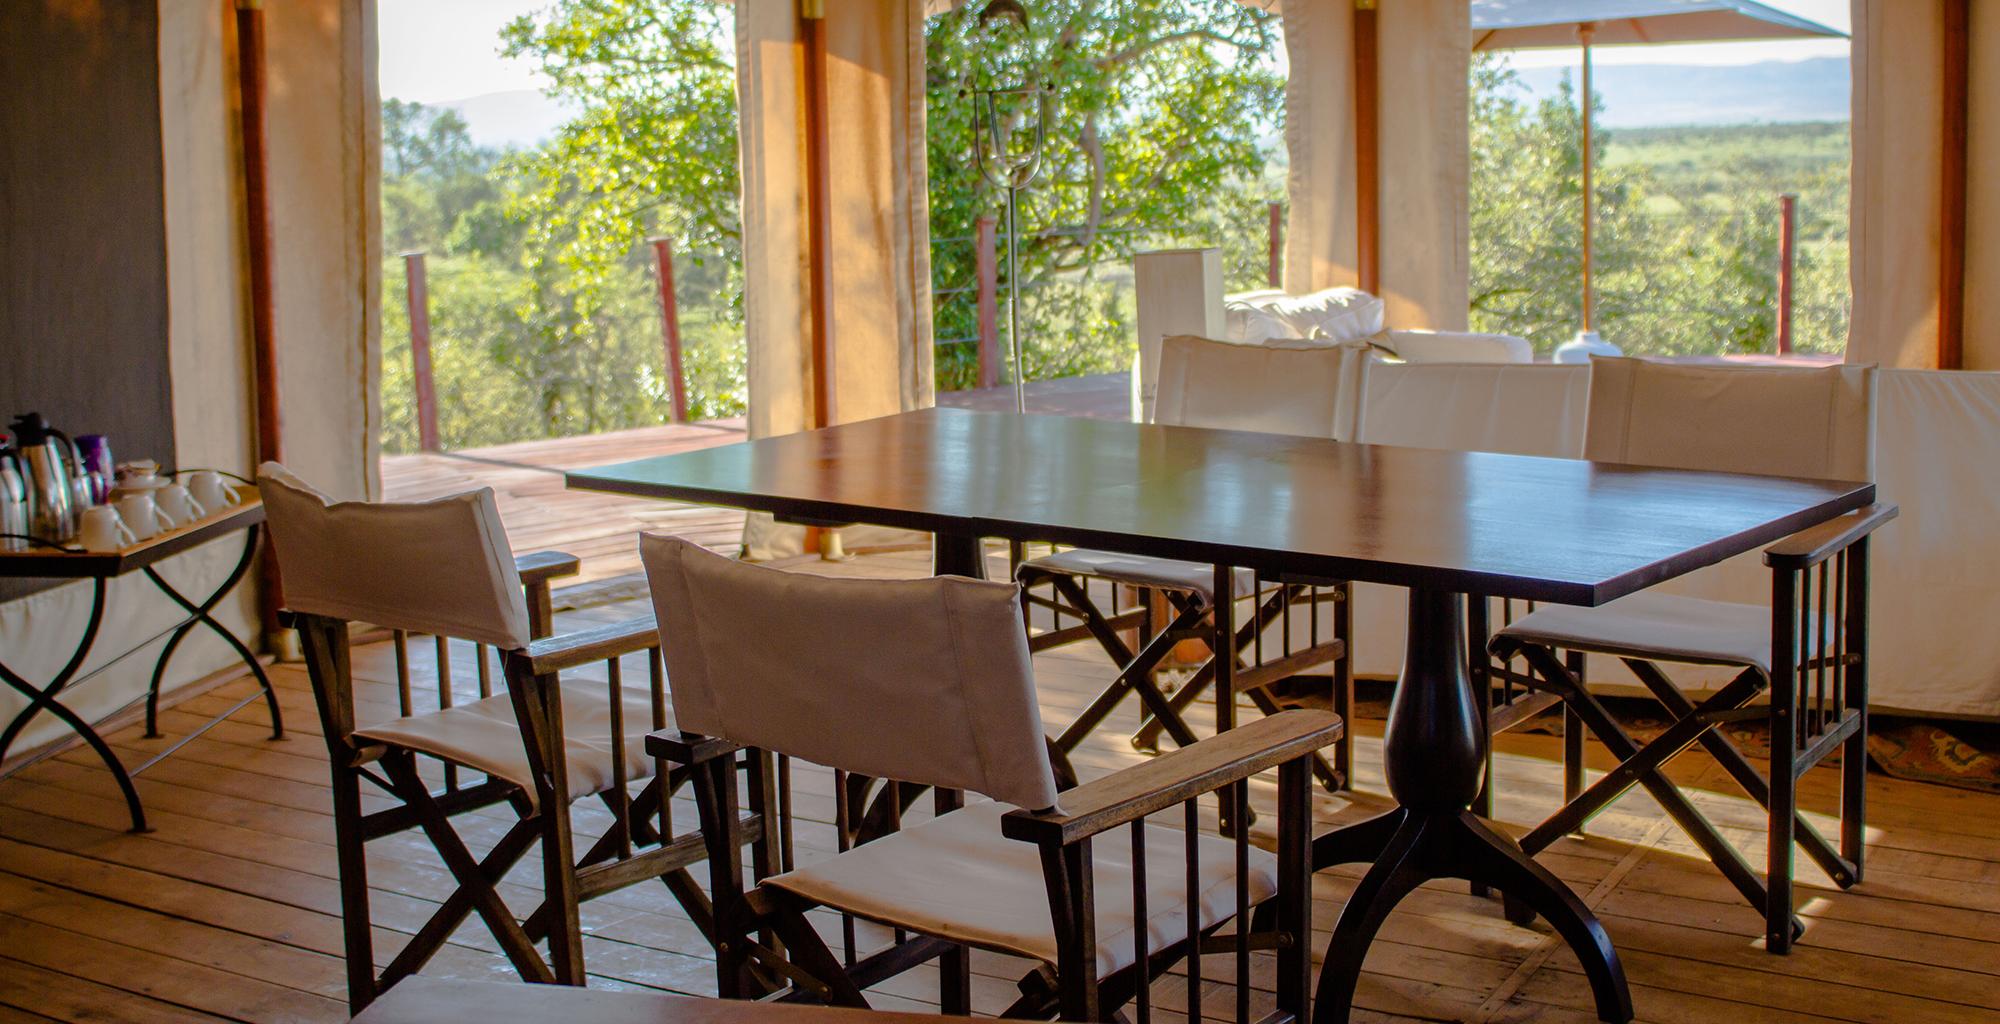 Kenya-Ol-Seki-Camp-Dining-Table